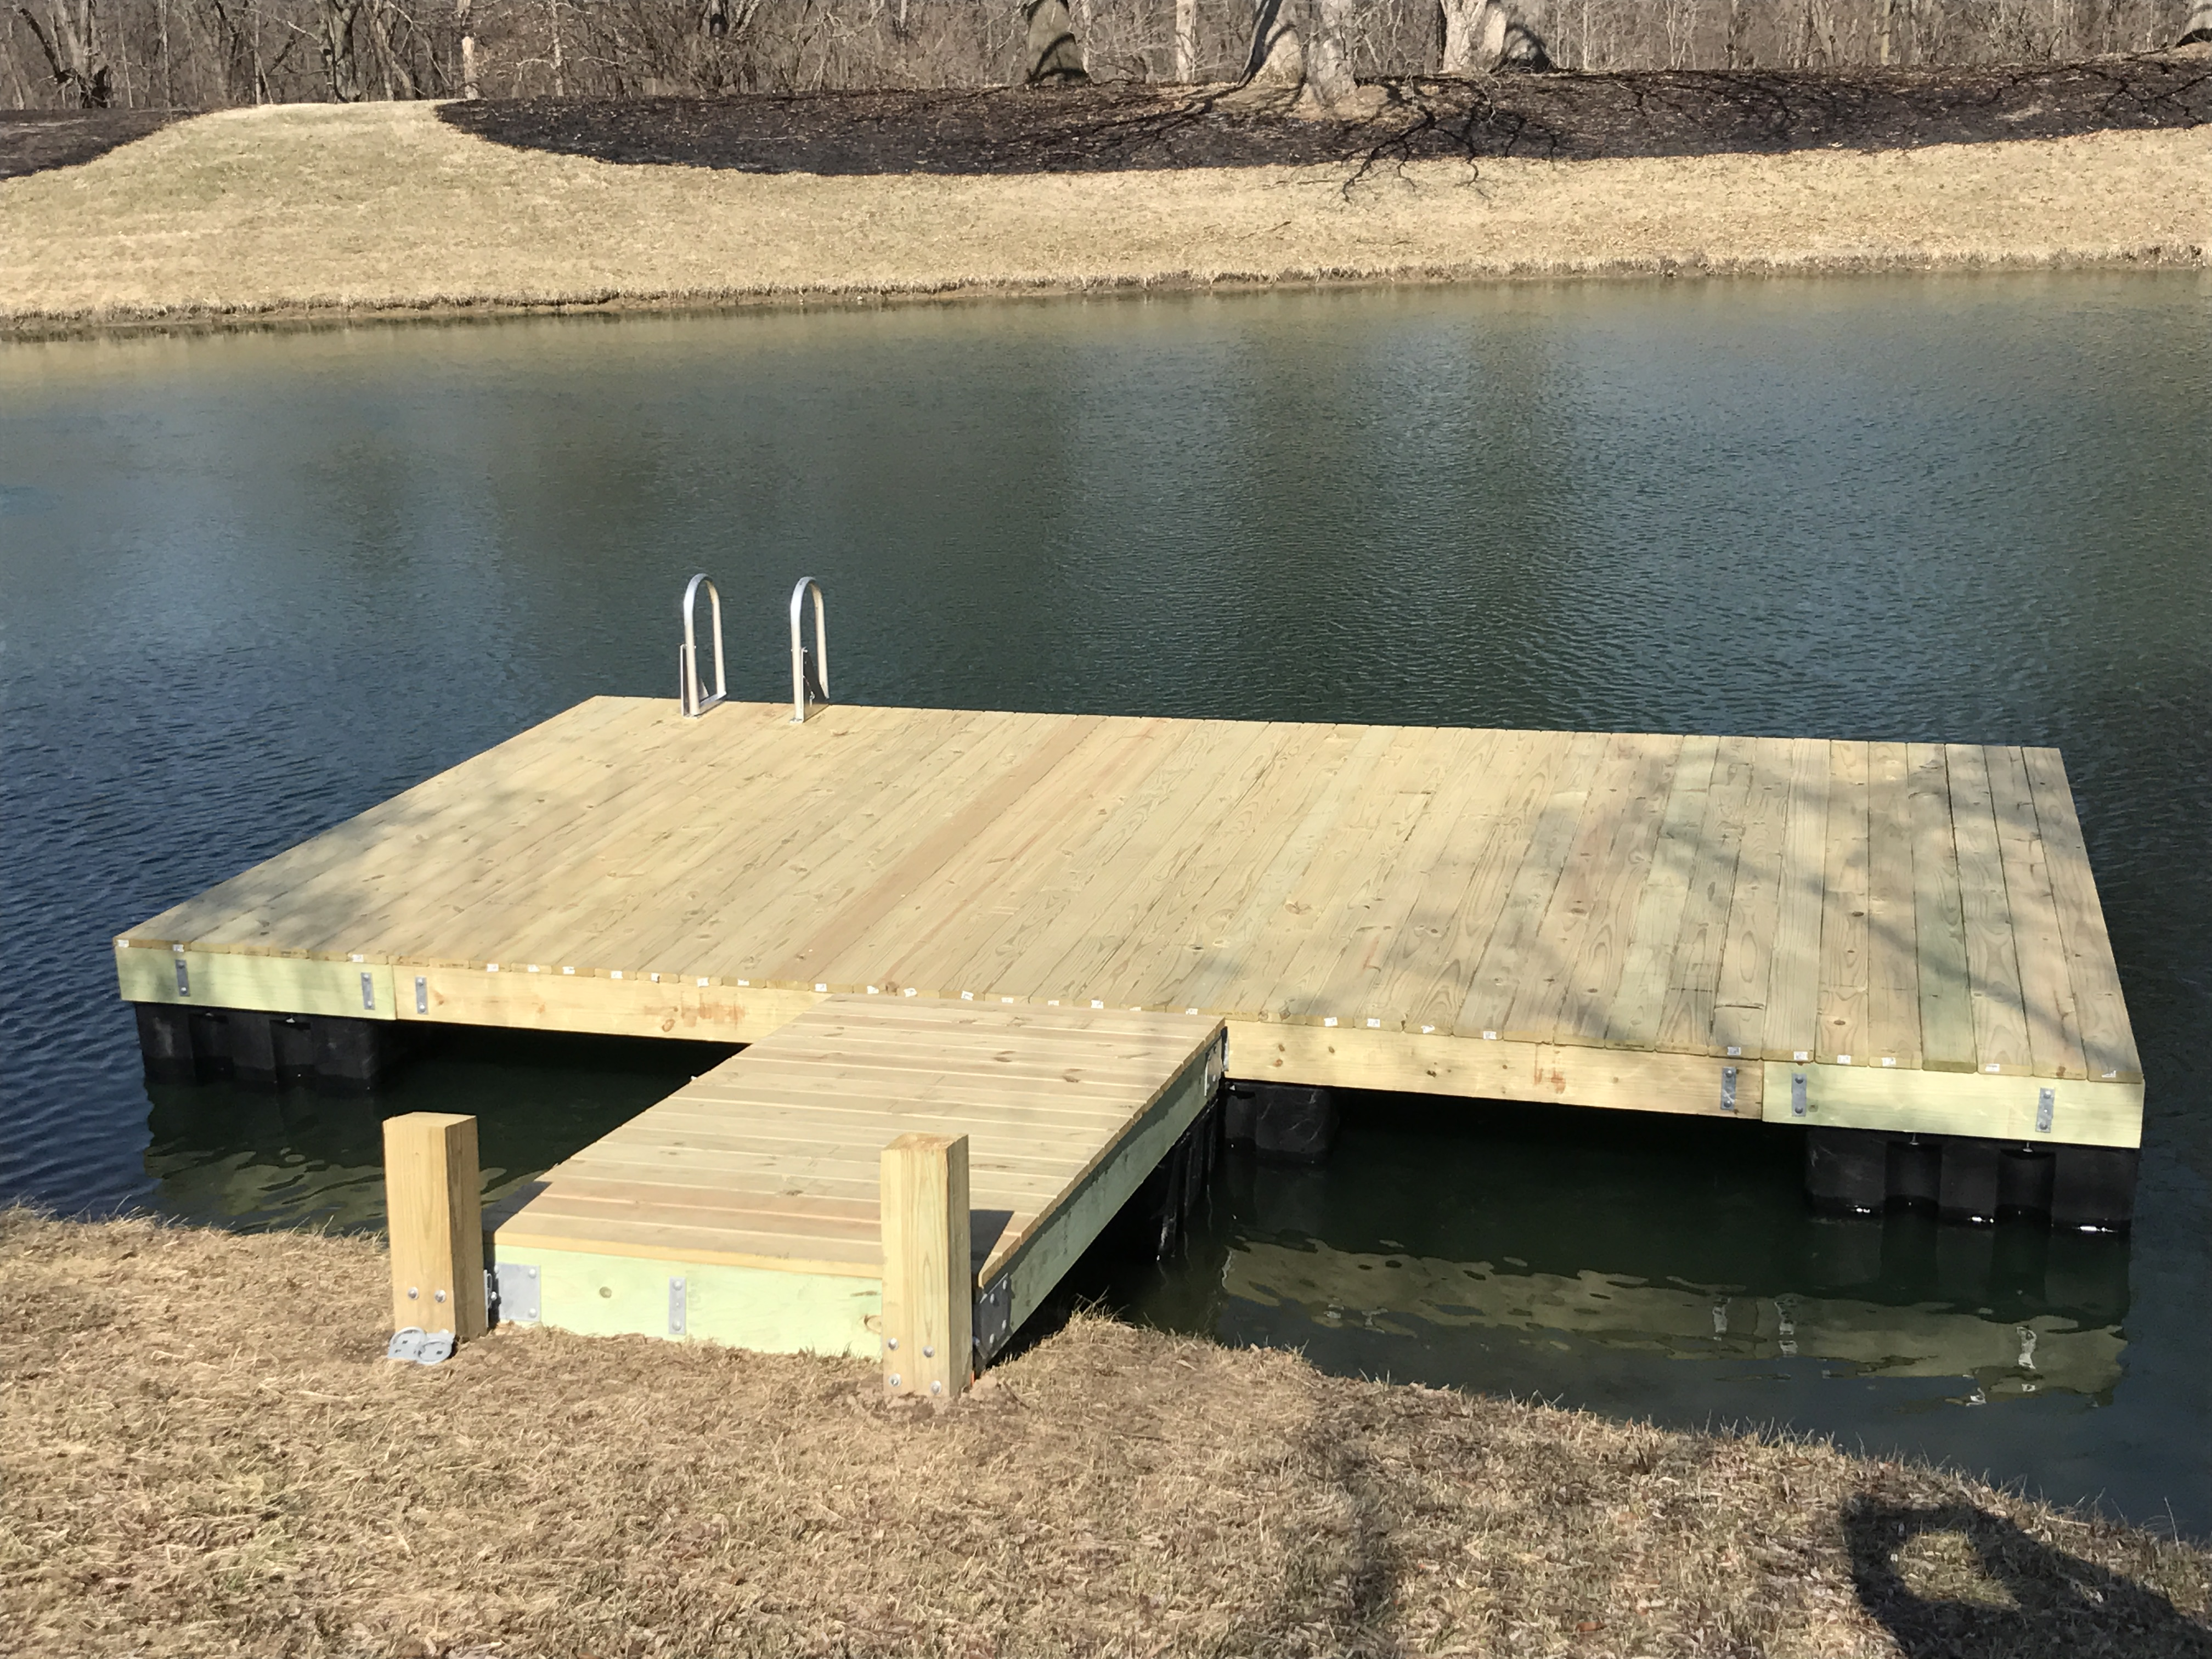 Dock swim platform kit 12 ft x 12 ft bjornsen pond for Floating fishing platform